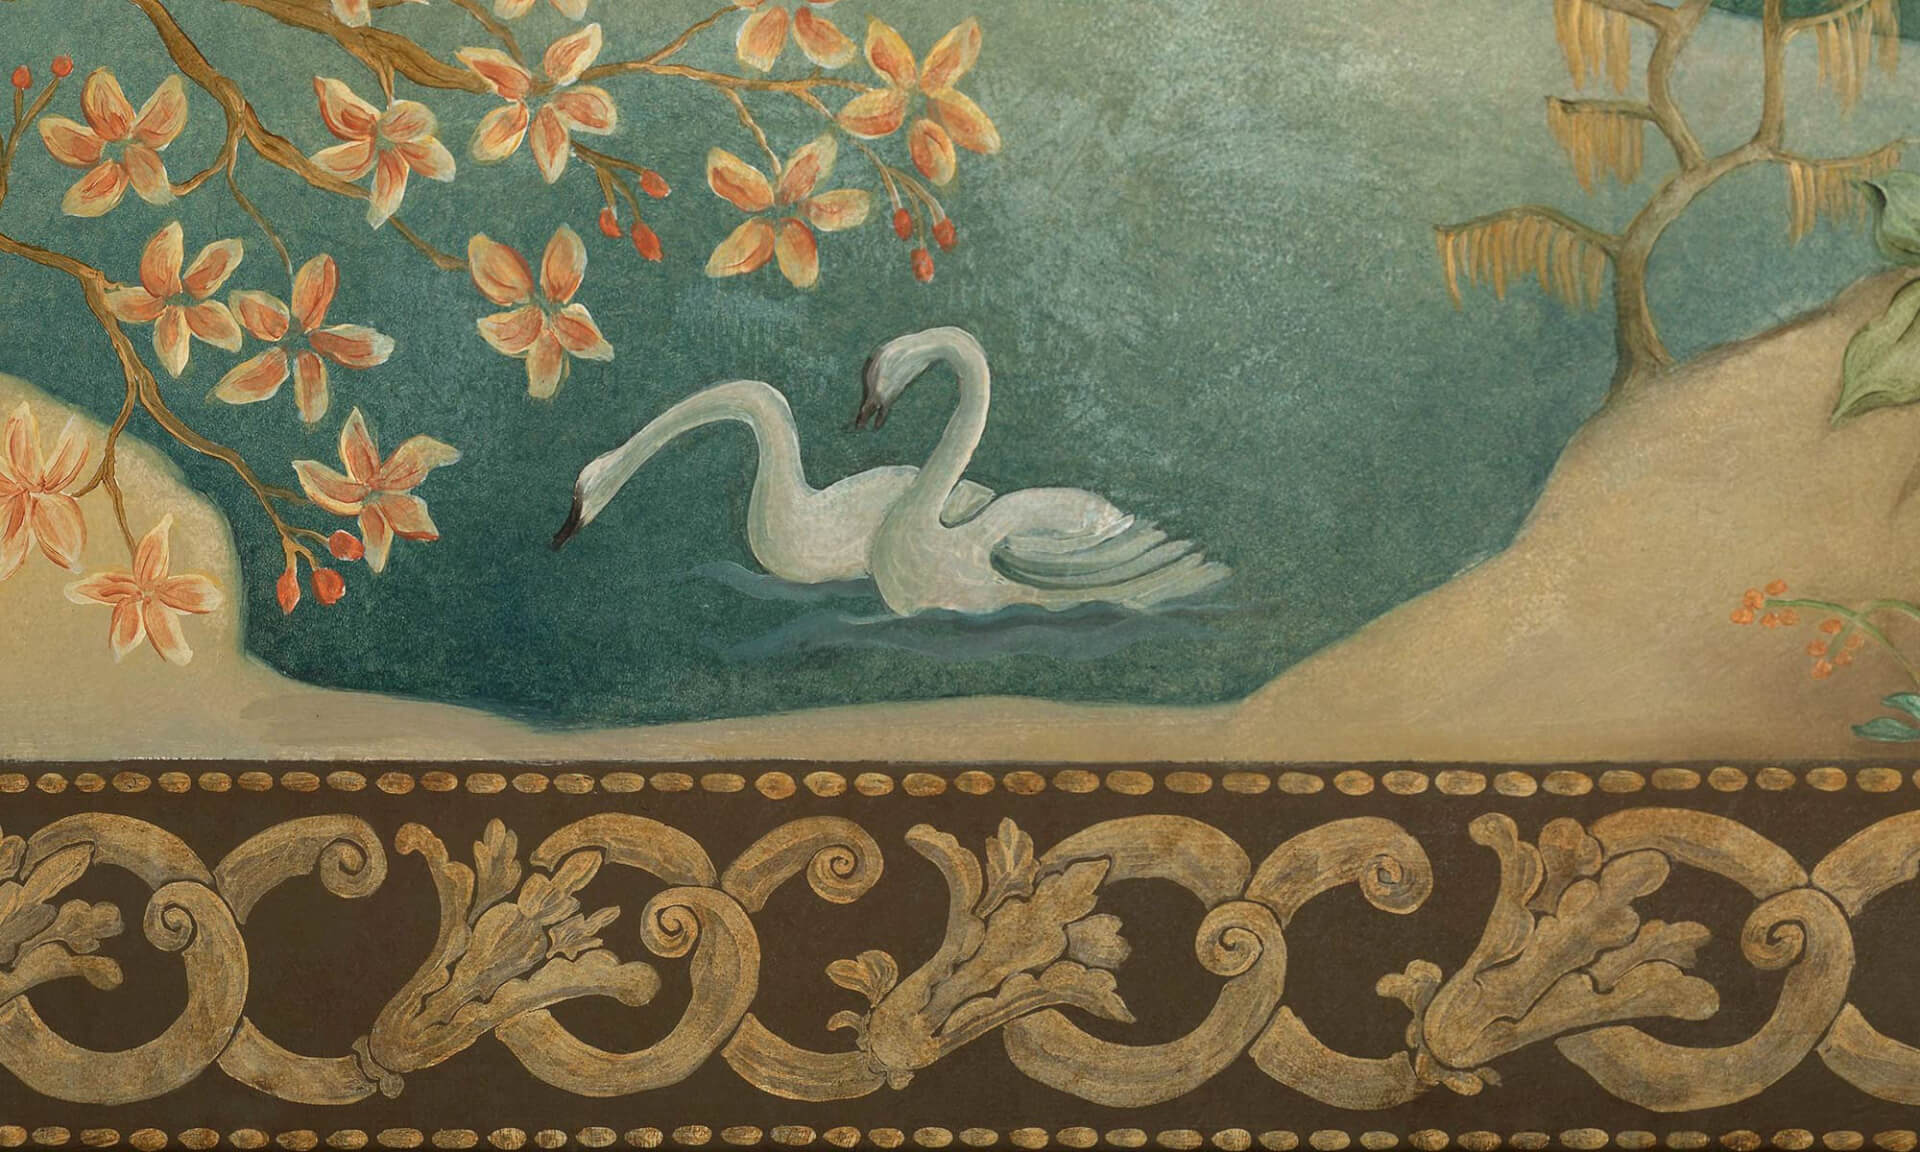 Ozz-Chinois - Detail Swan Lena Fransioli & Brooke Sheldon